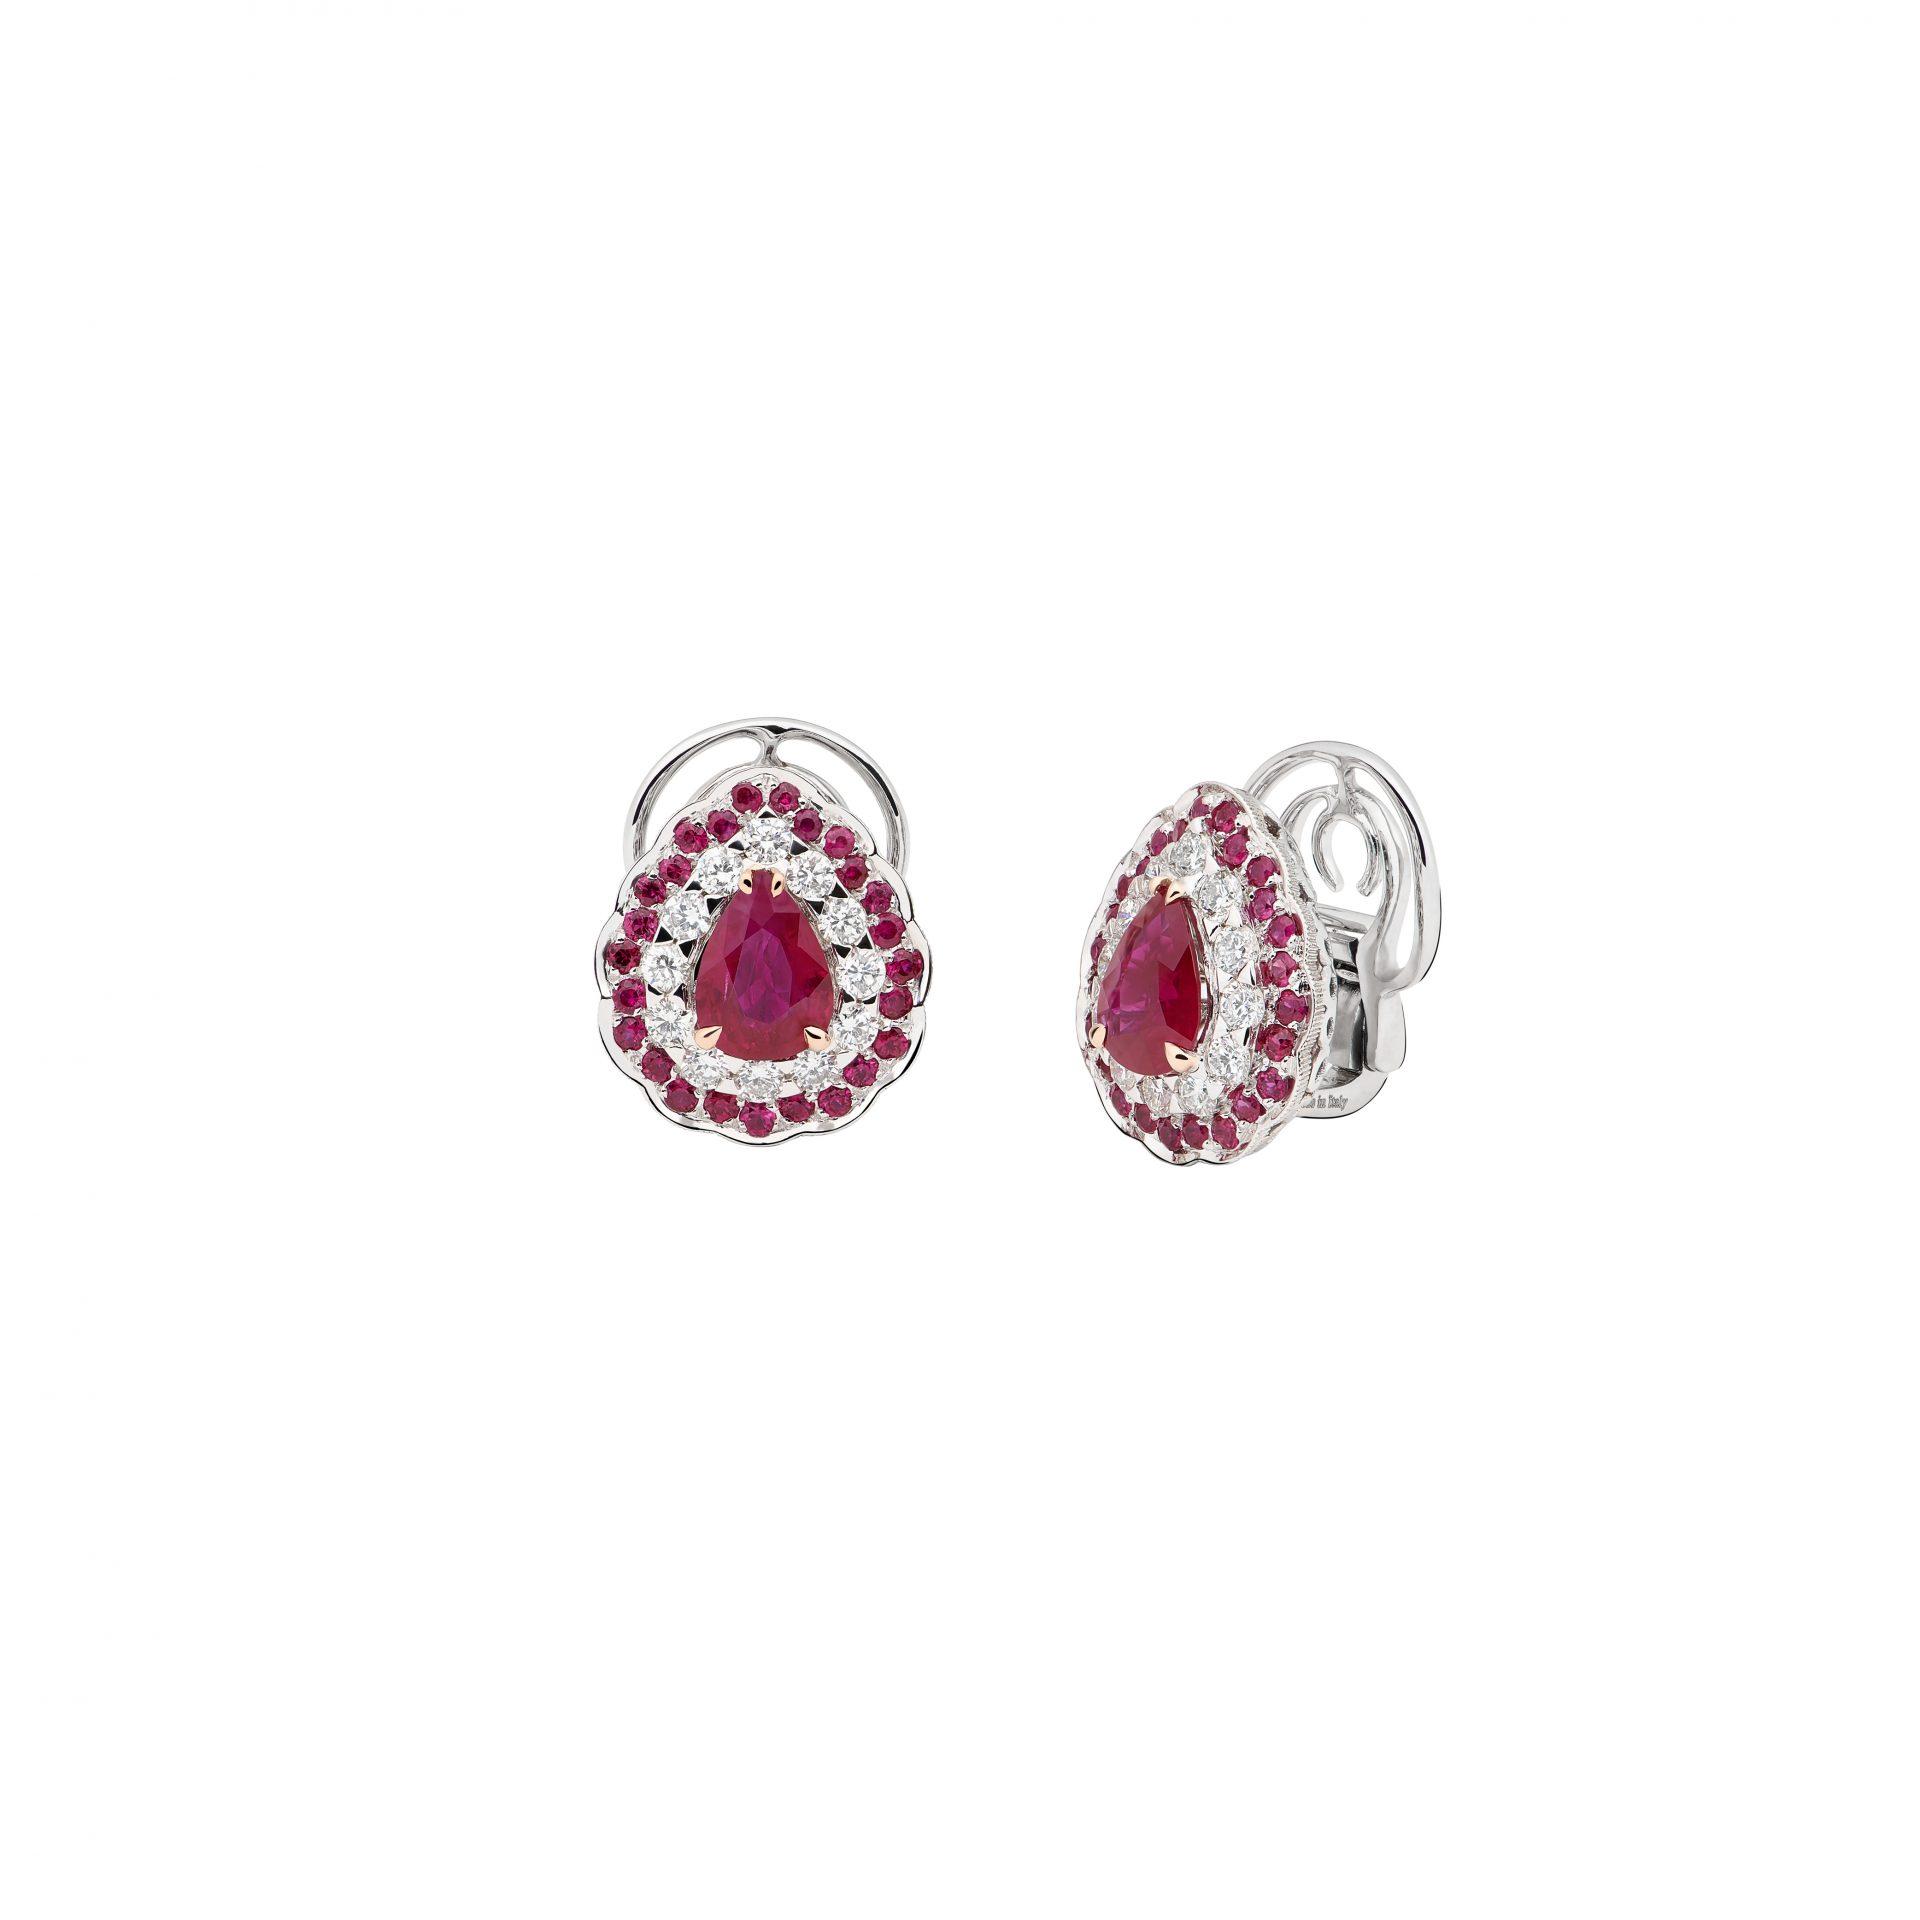 La Broderie Rouge Earrings